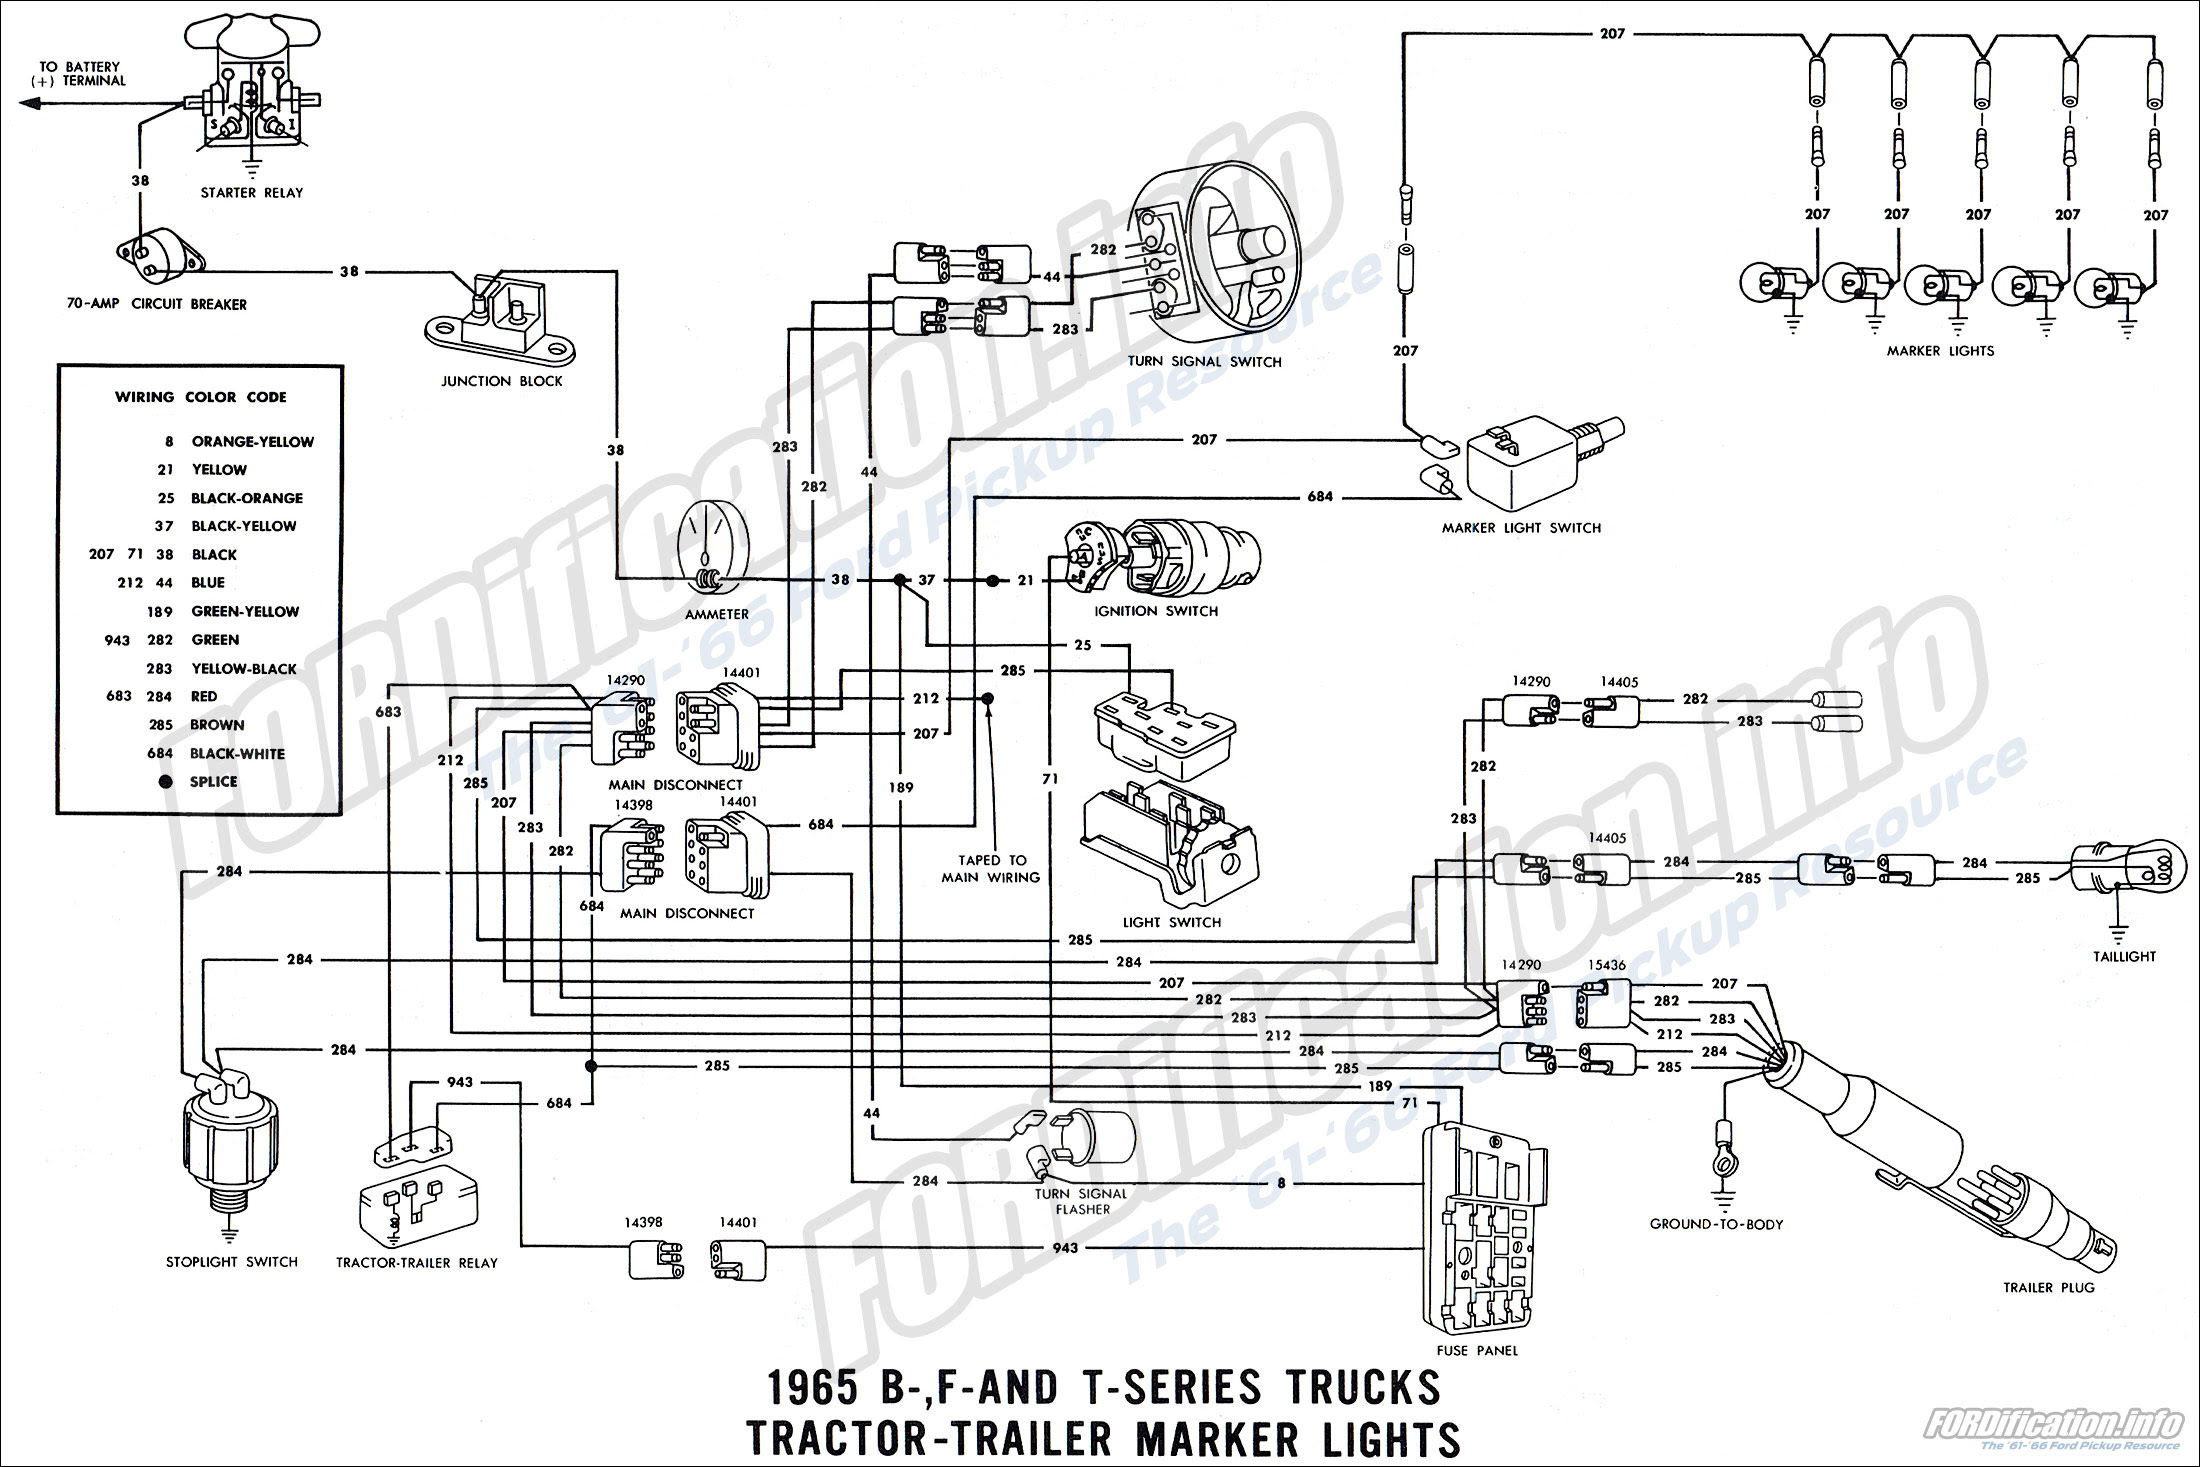 [DIAGRAM] Simple Diesel Tractor Ignition Wiring Diagram